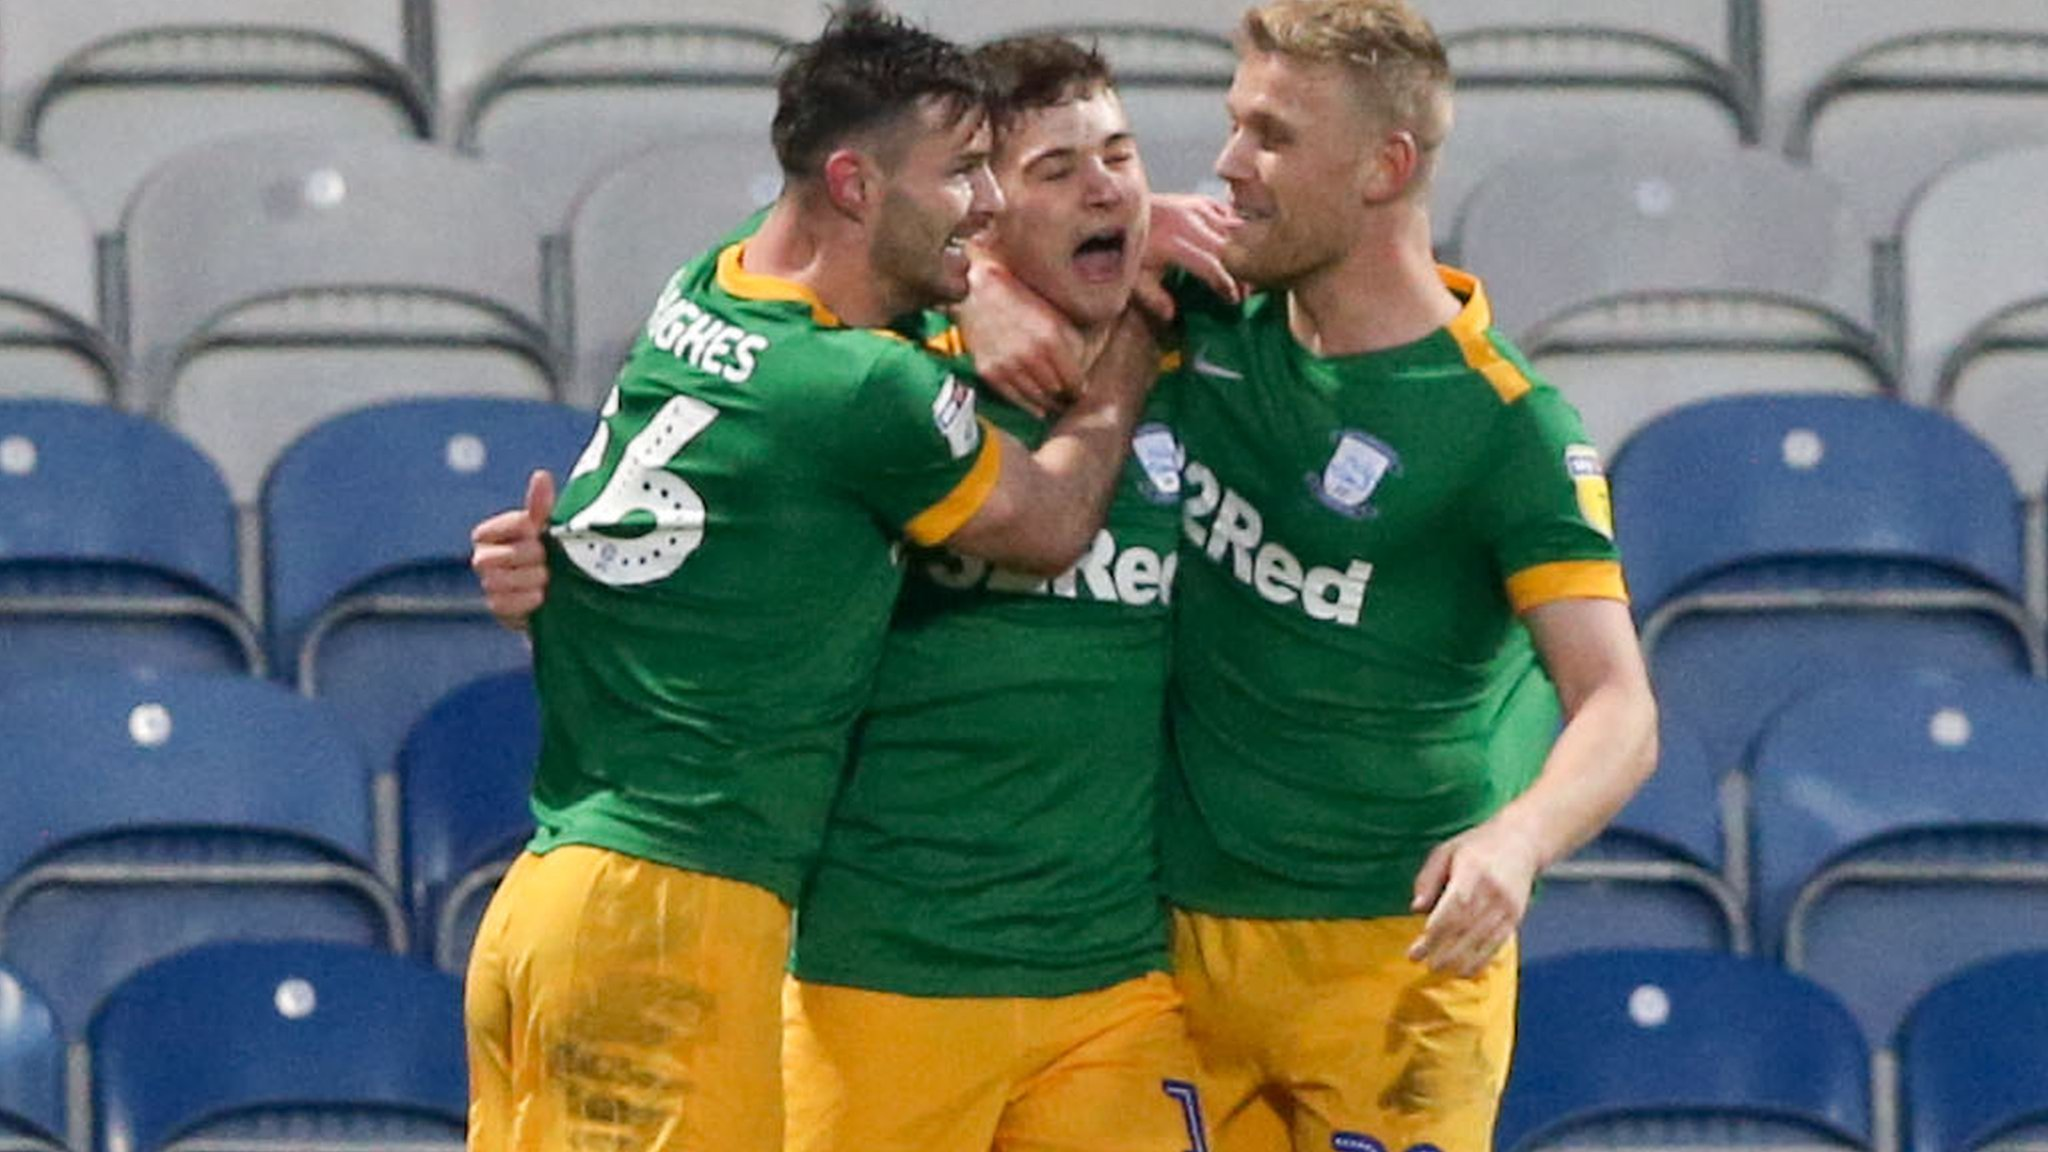 QPR 1-4 Preston North End: Lilywhites' January signings shine at Loftus Road